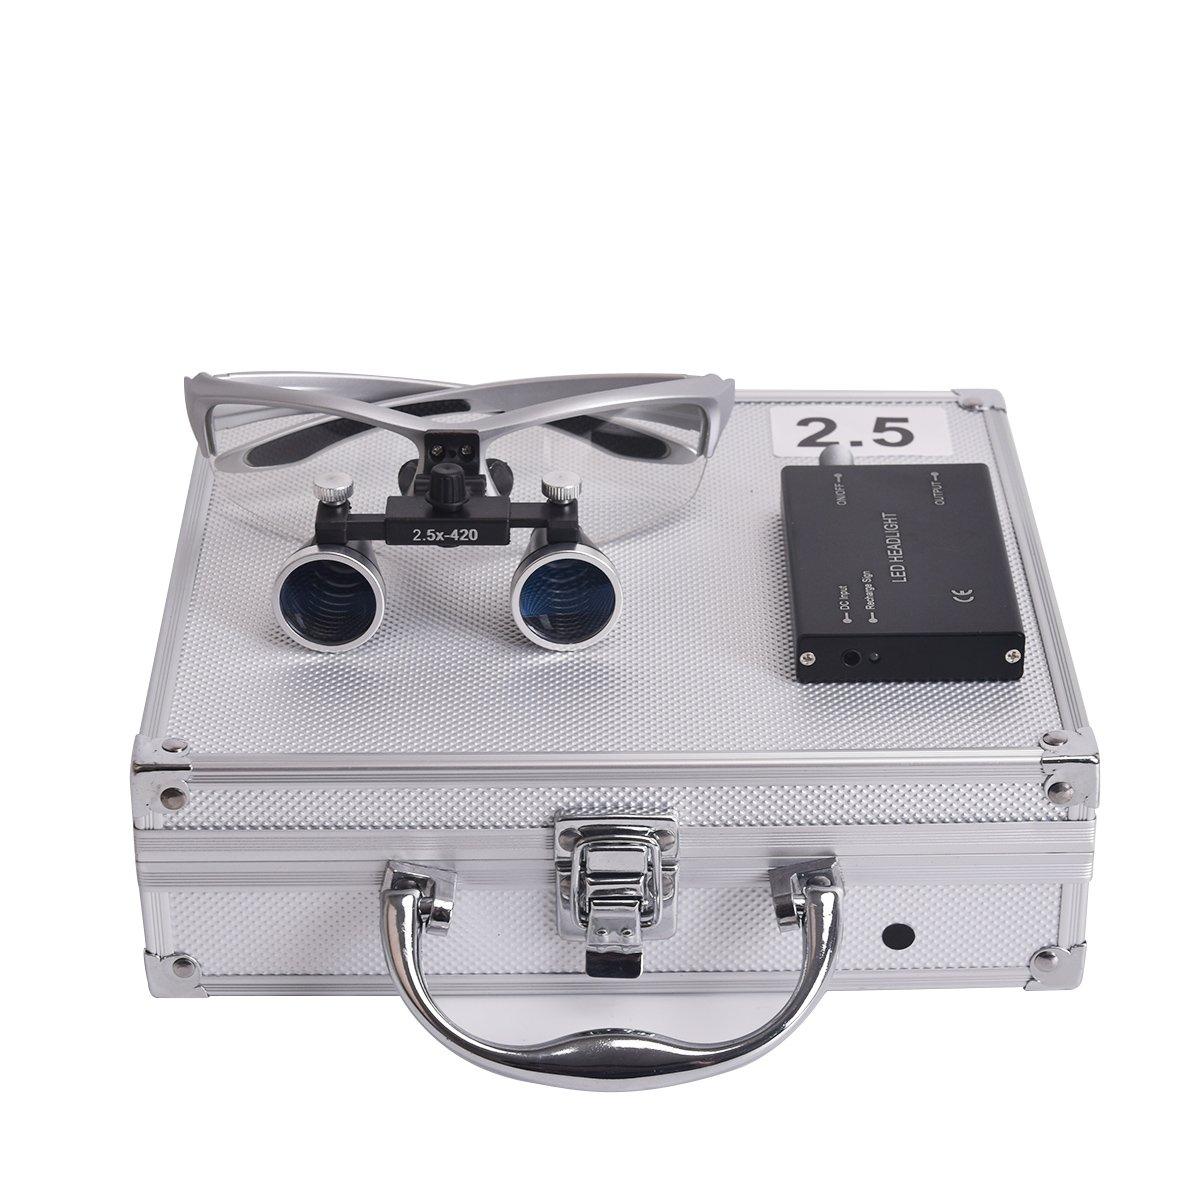 Annhua 2.5 x 420MM Dental Magnifier Surgical Binocular Loupes Headlight with Aluminum Box